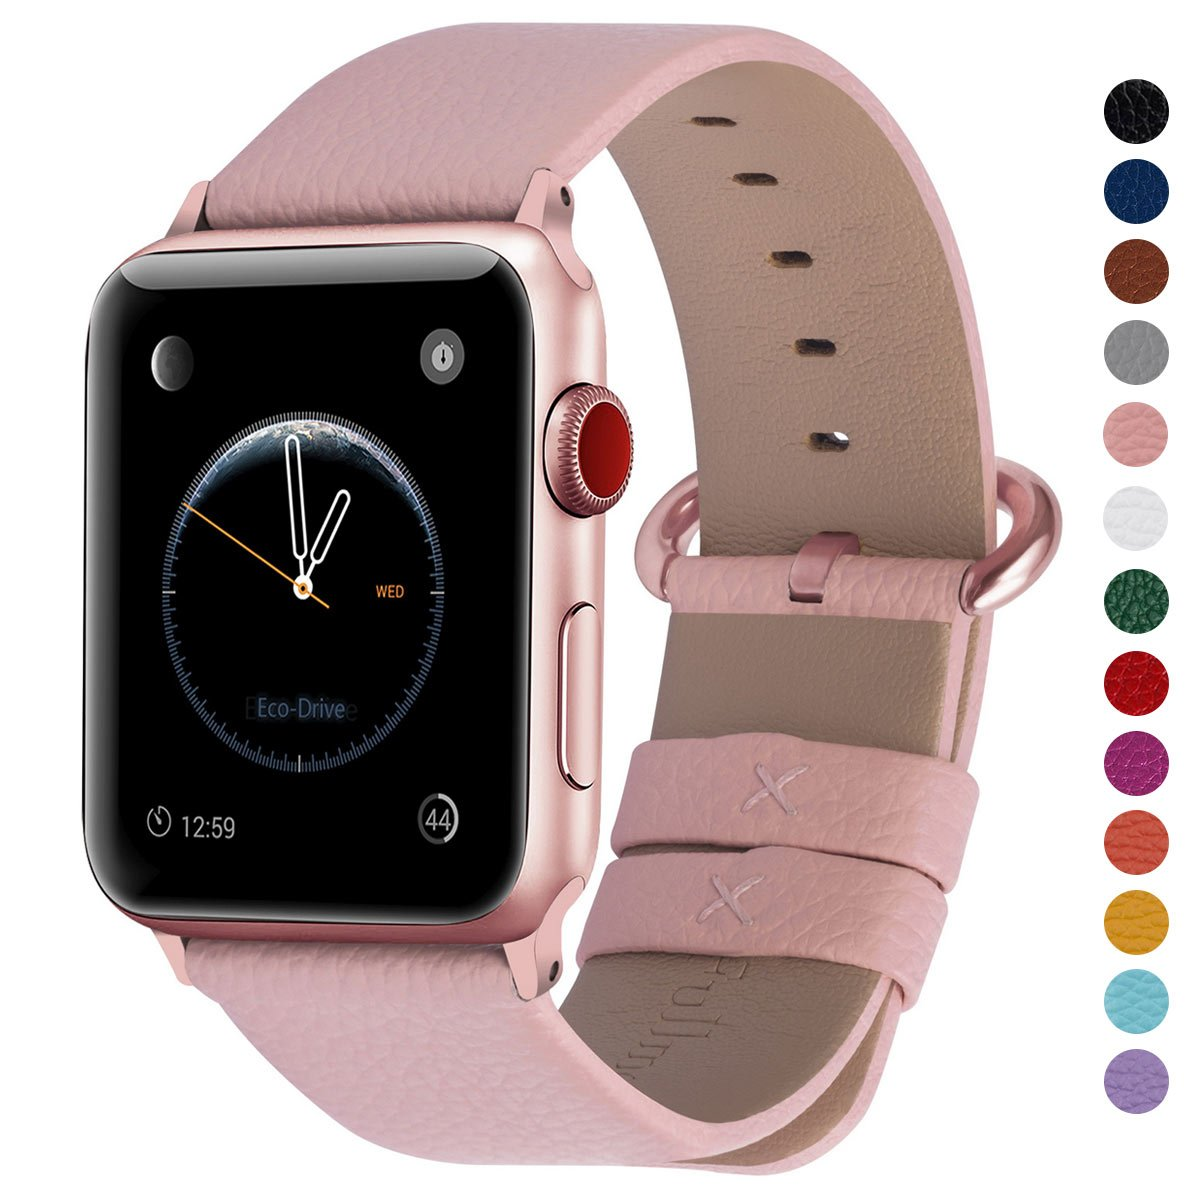 Malla Cuero para Apple Watch (42/44mm) FULLMOSA [787R1C61]